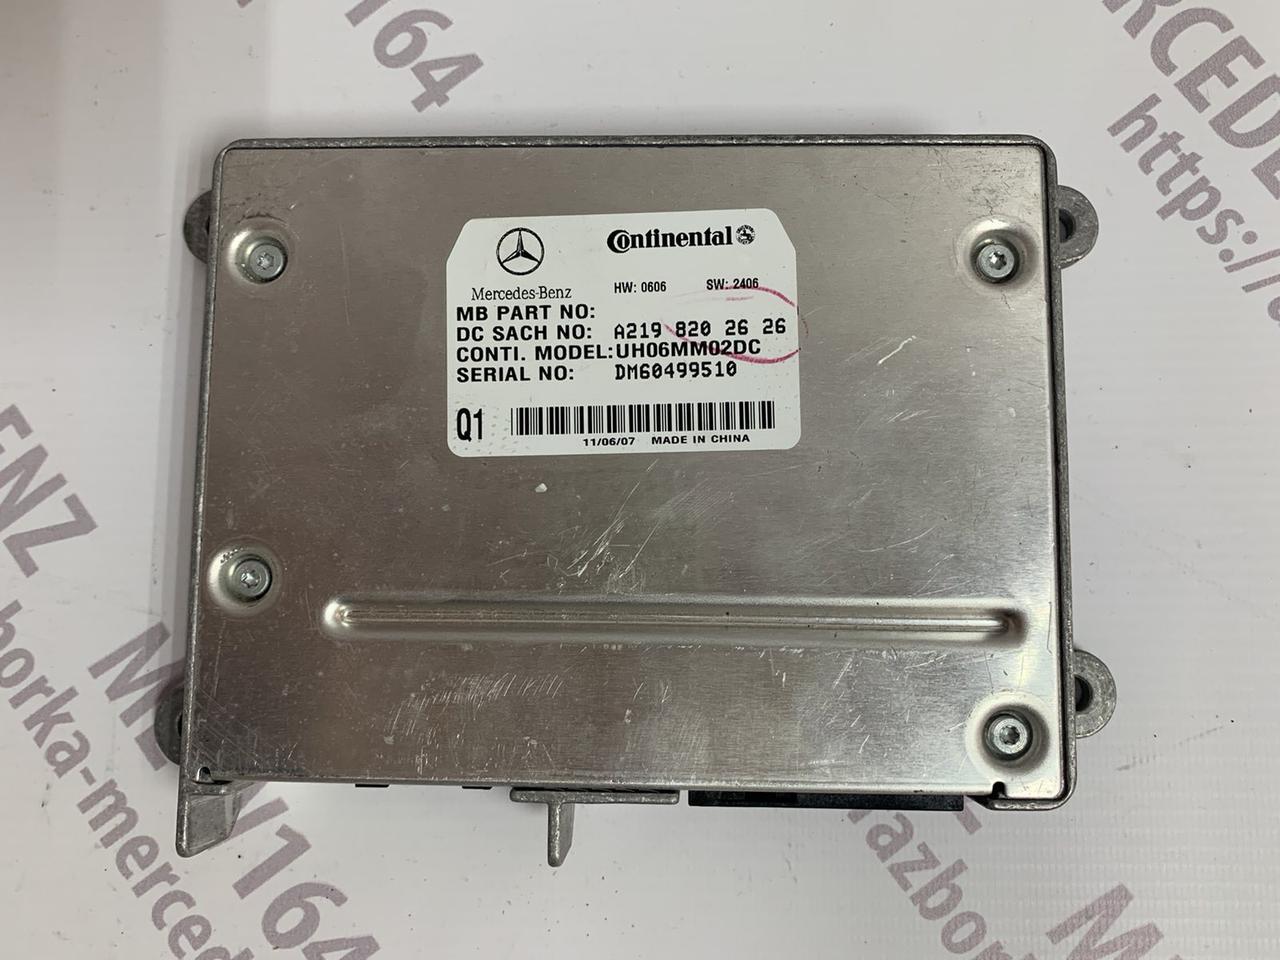 Блок управления телефоном А2198202626 Mercedes ML W164 / GL X164 управління телефоном Мерседес мл гл 164